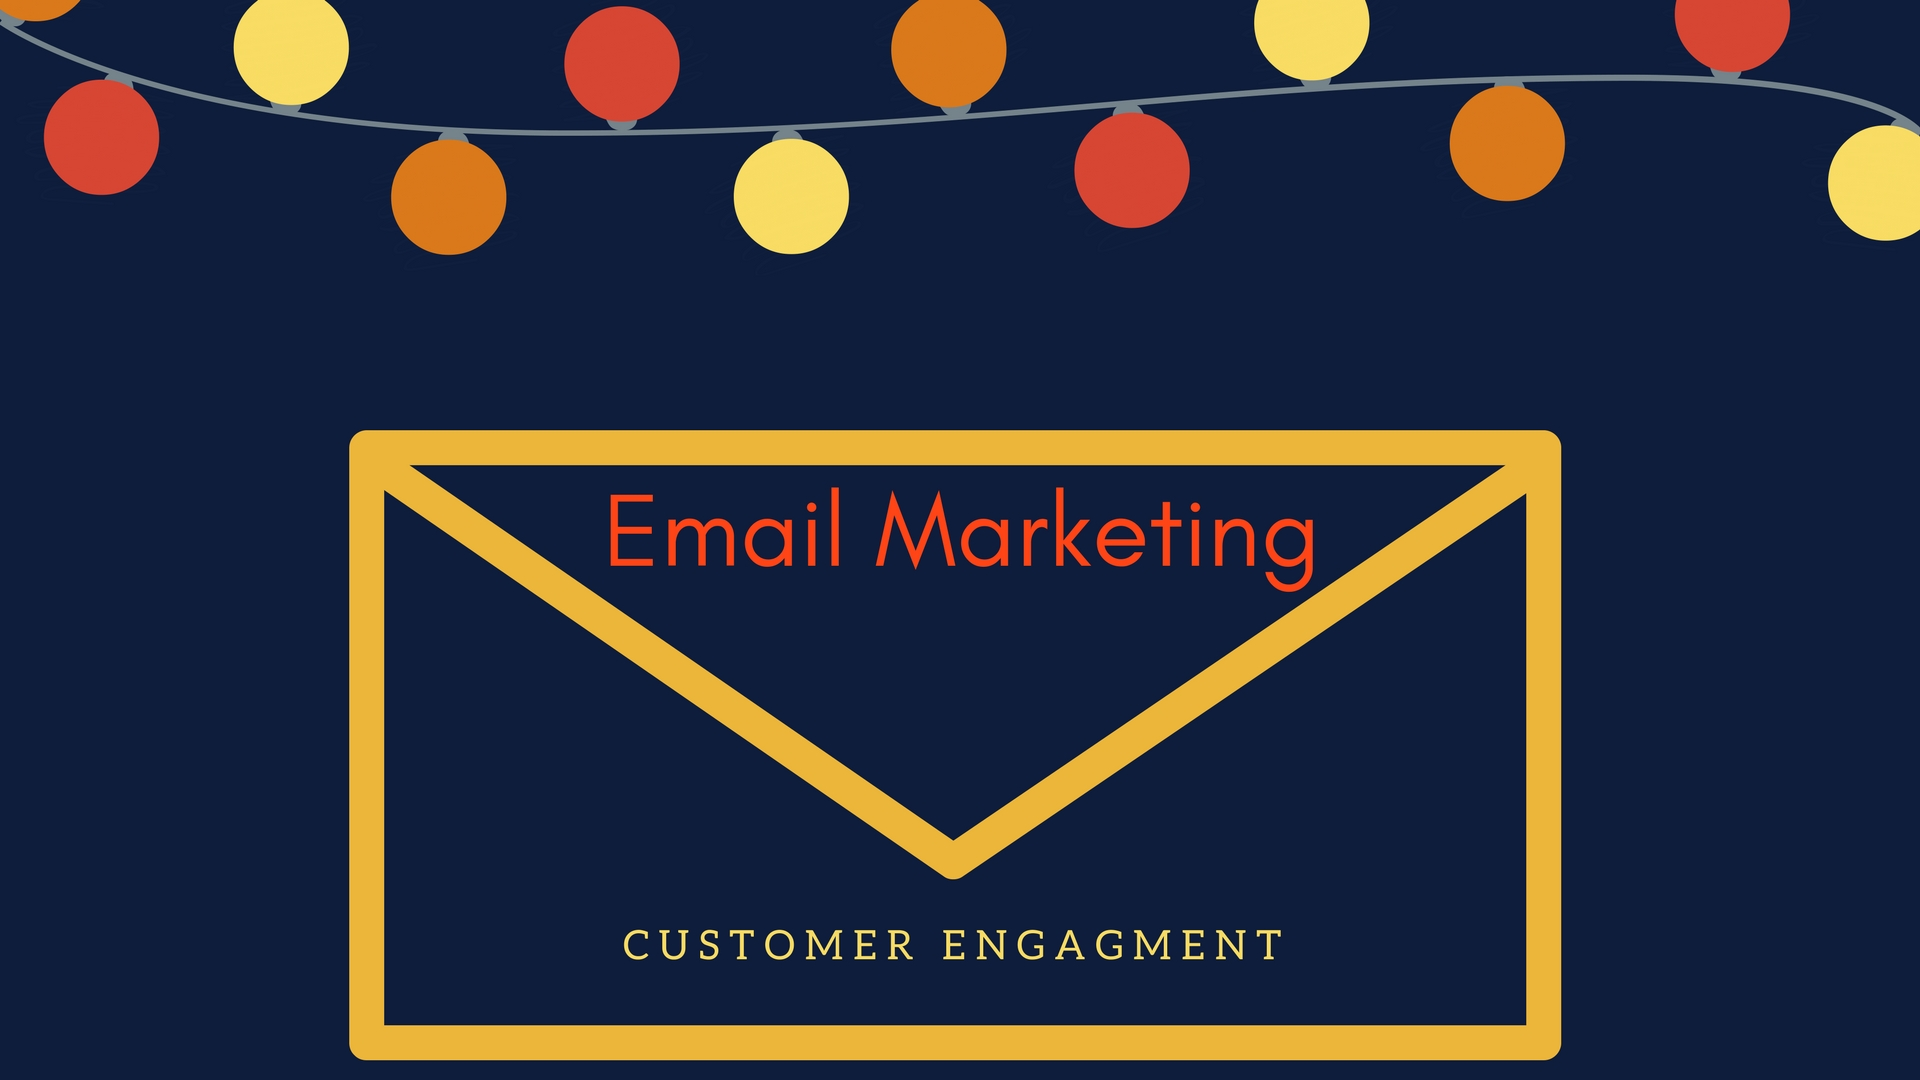 Online Copywriter Melinda J. Irvine creates email marketing campaigns